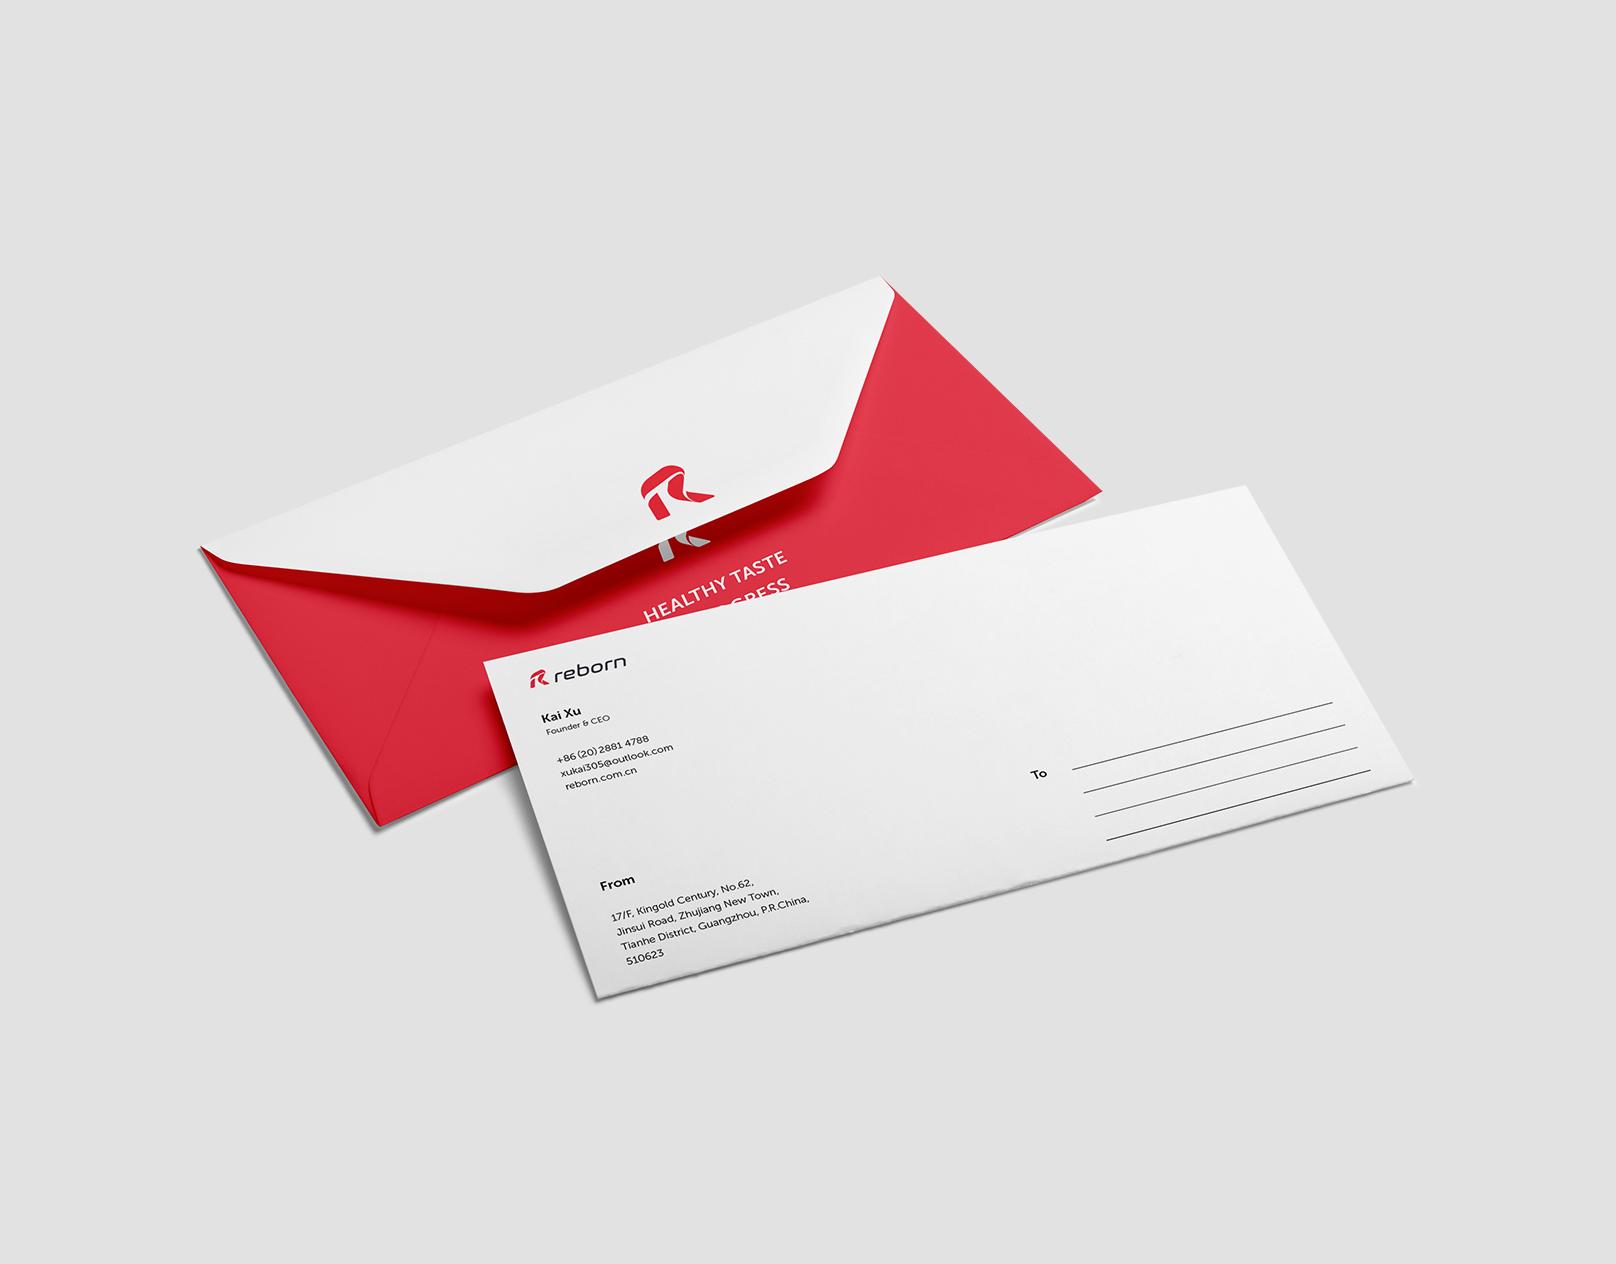 Tubik branding reborn envelope